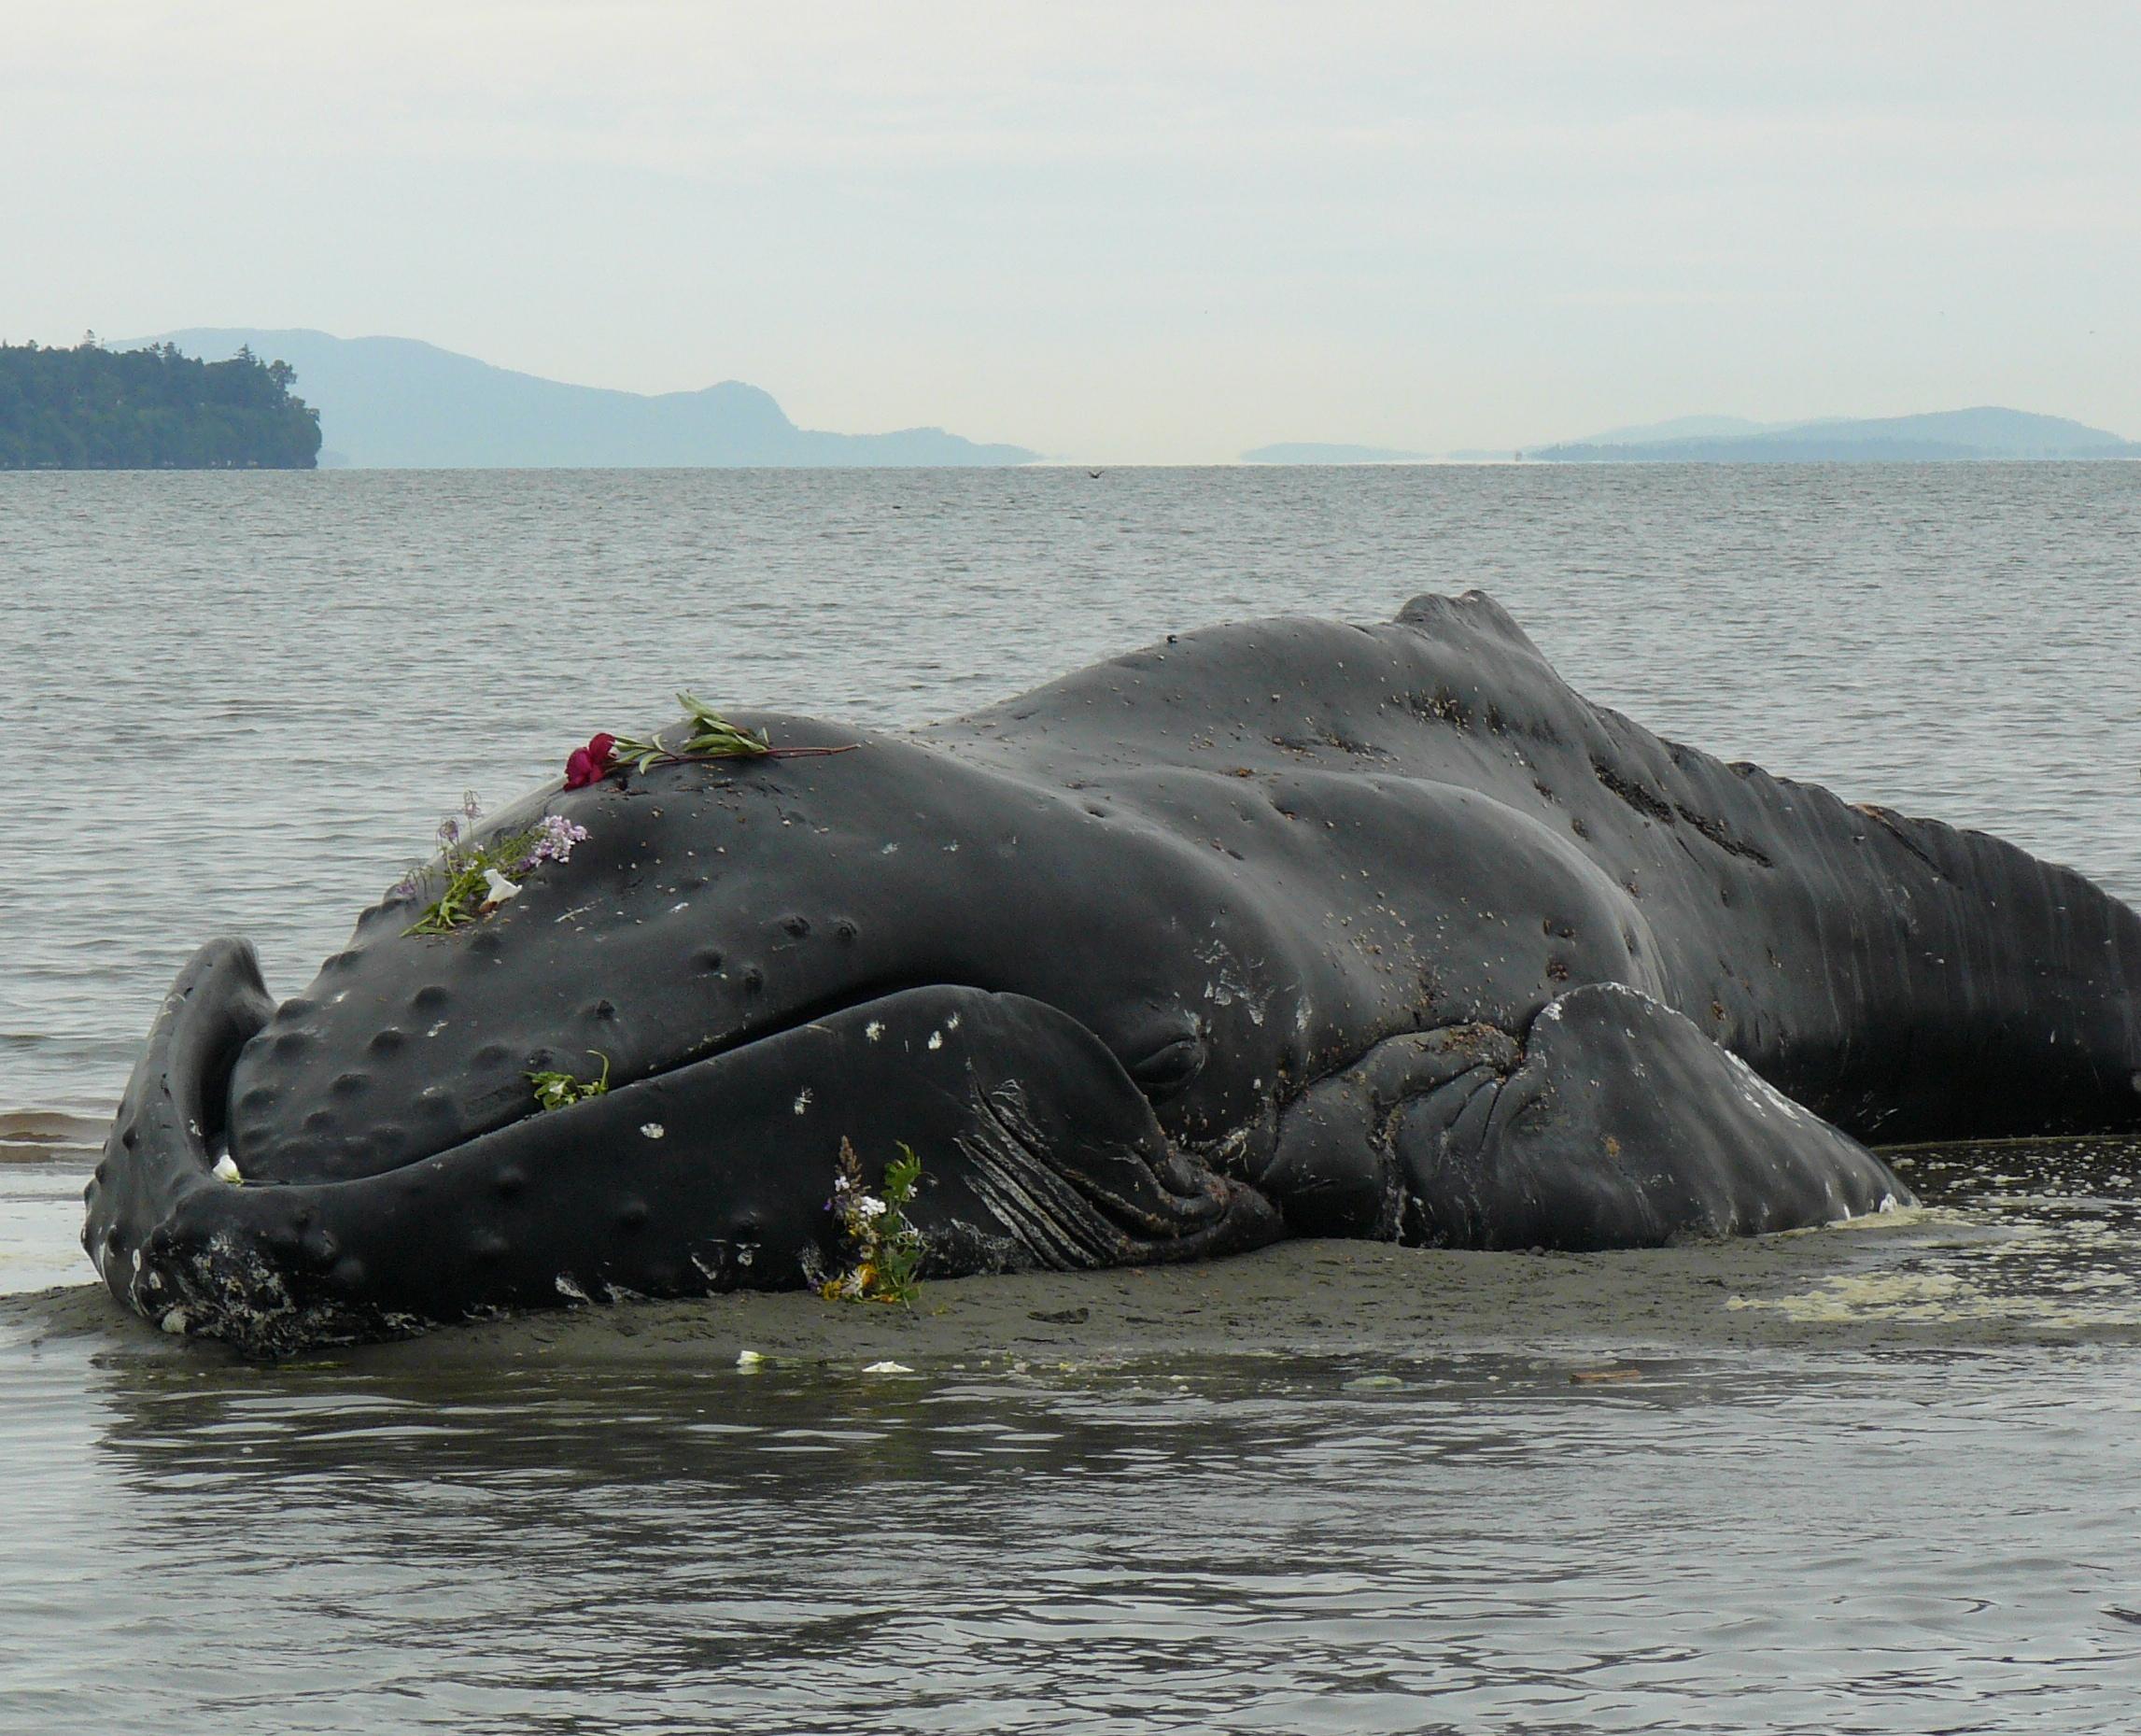 Humpback Whale Pearson College Marine Science